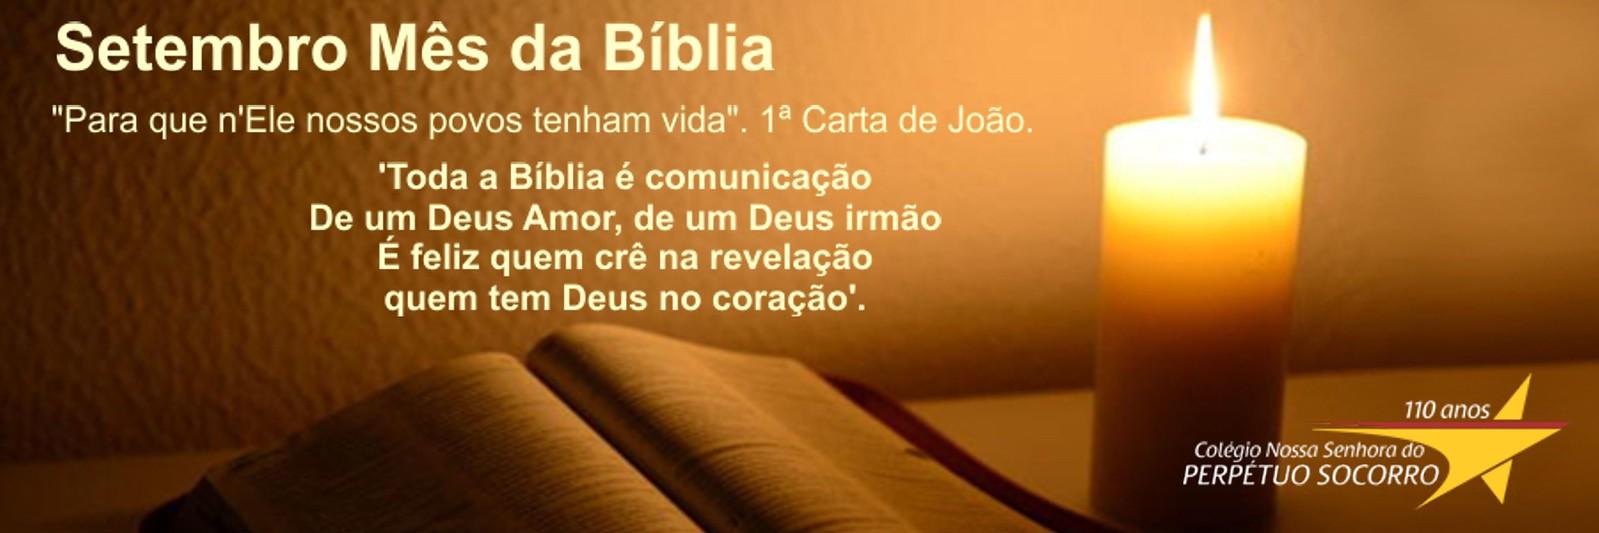 Setembro, mês da bíblia - Colégio Perpétuo Socorro